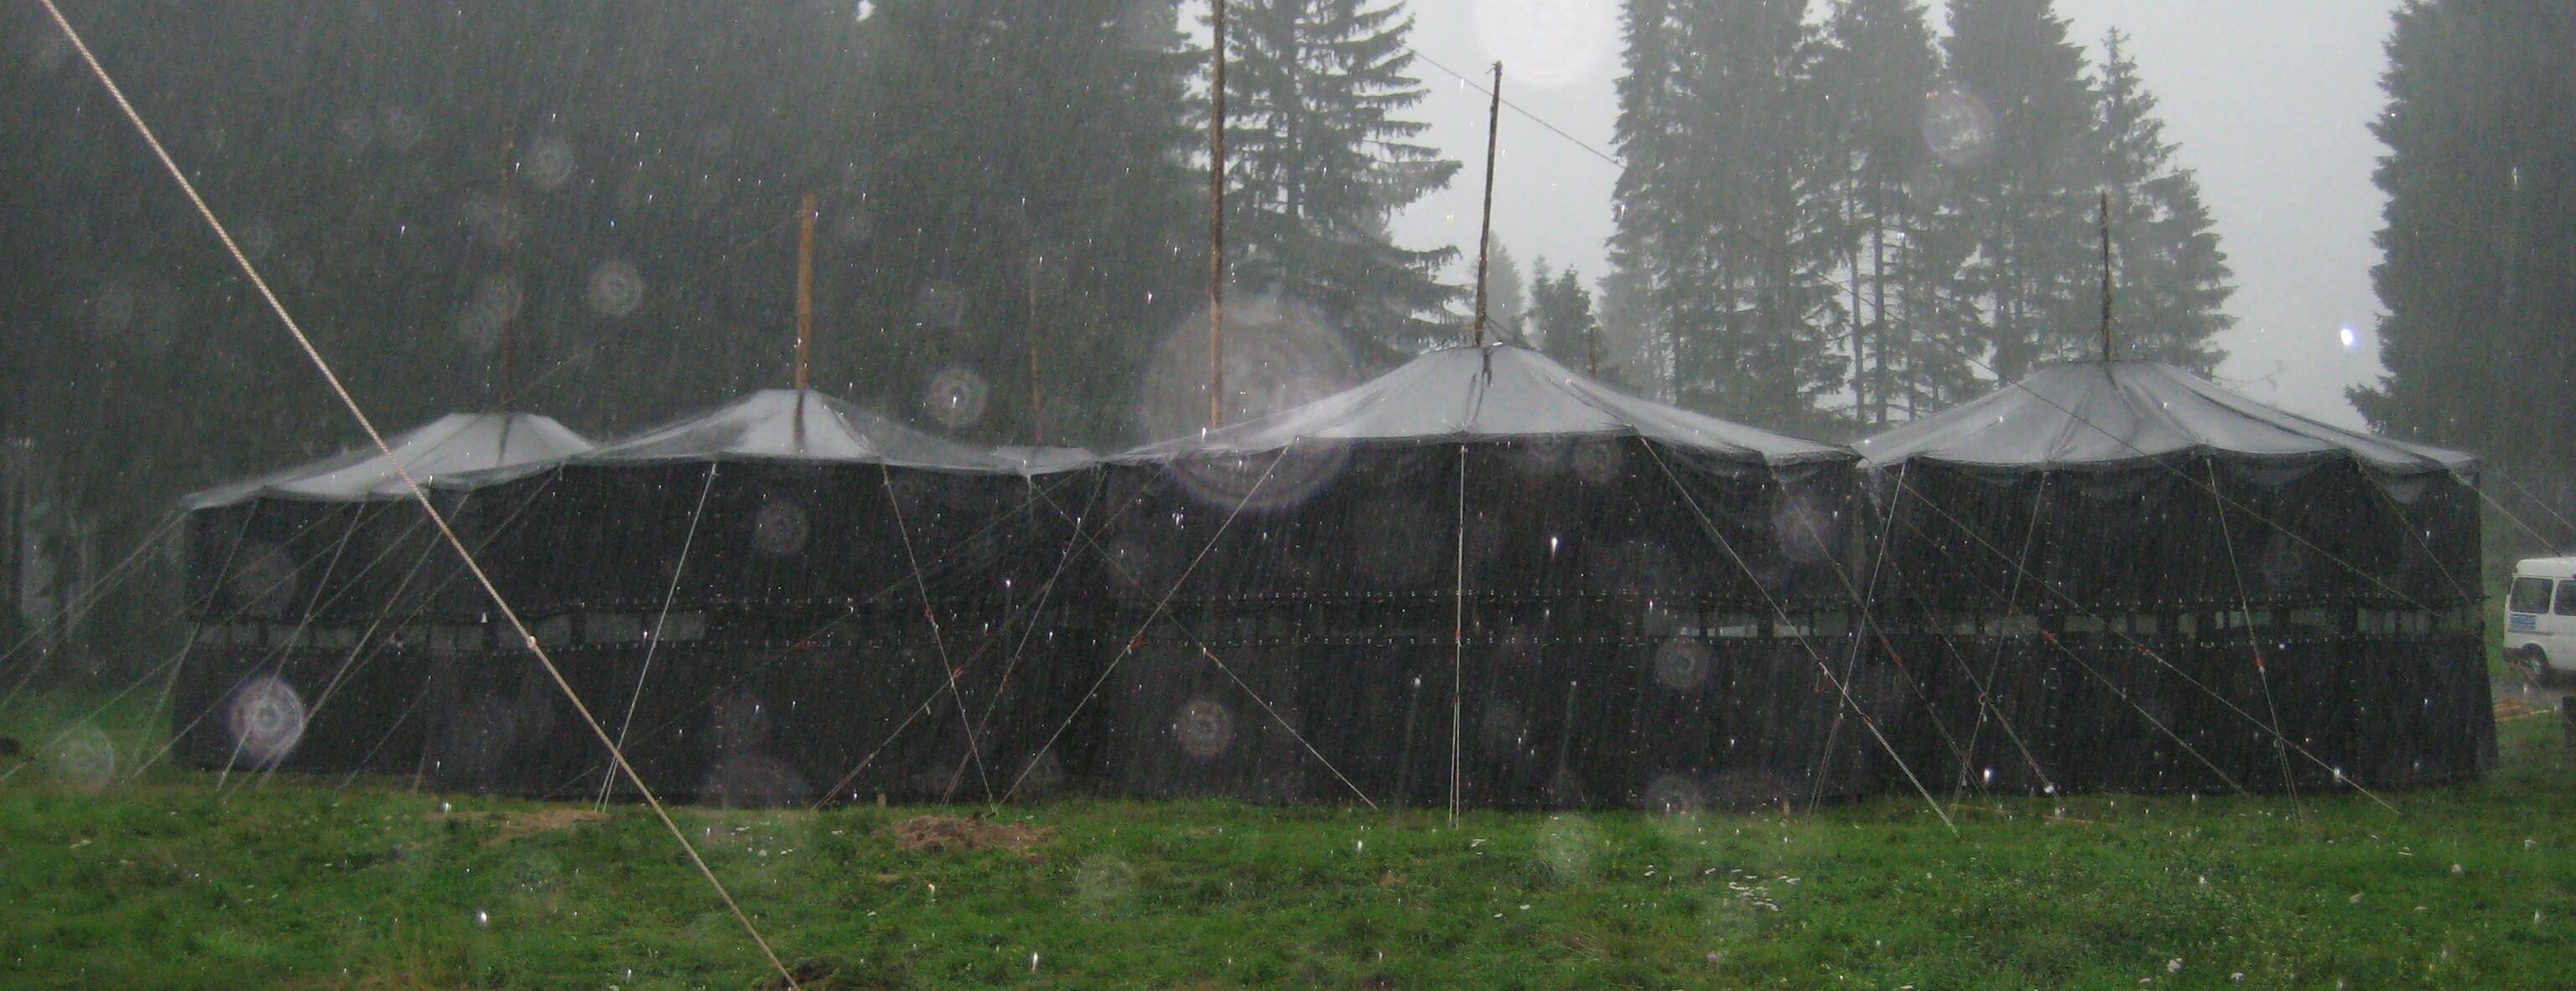 Zelt im Regen (Meuterei)